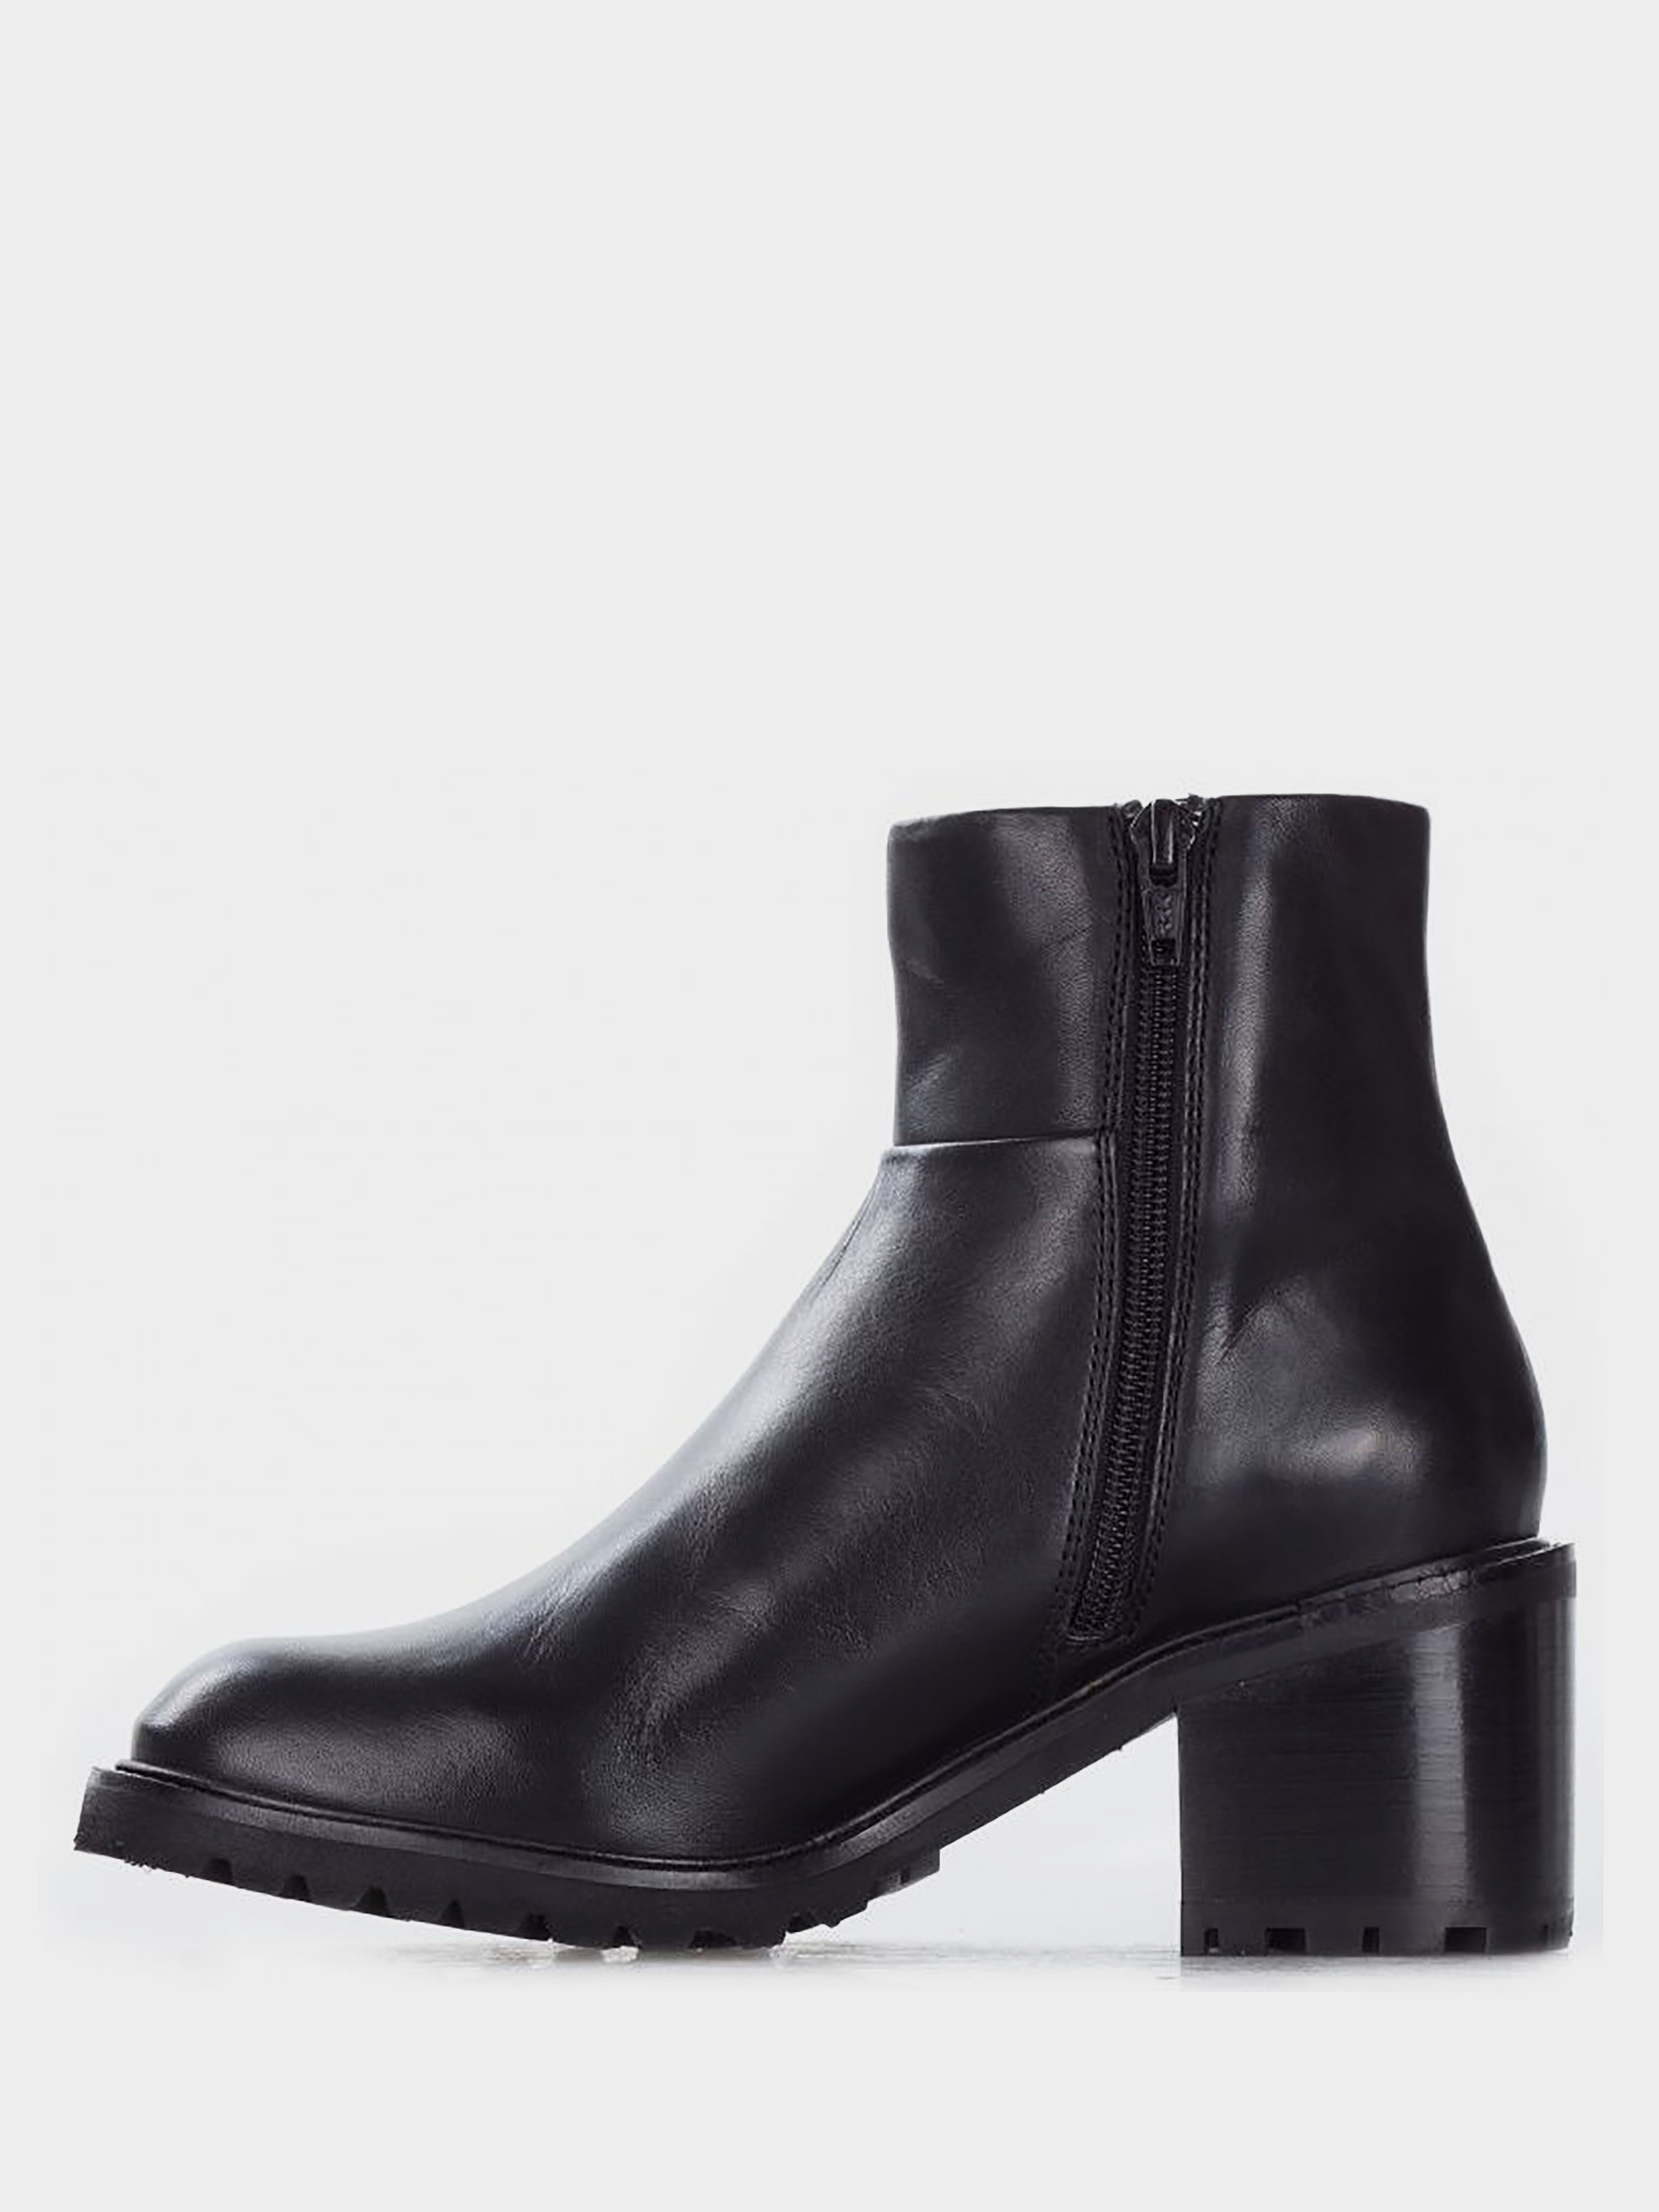 Ботинки для женщин Braska черевики жін. (36-41) BS3024 модная обувь, 2017